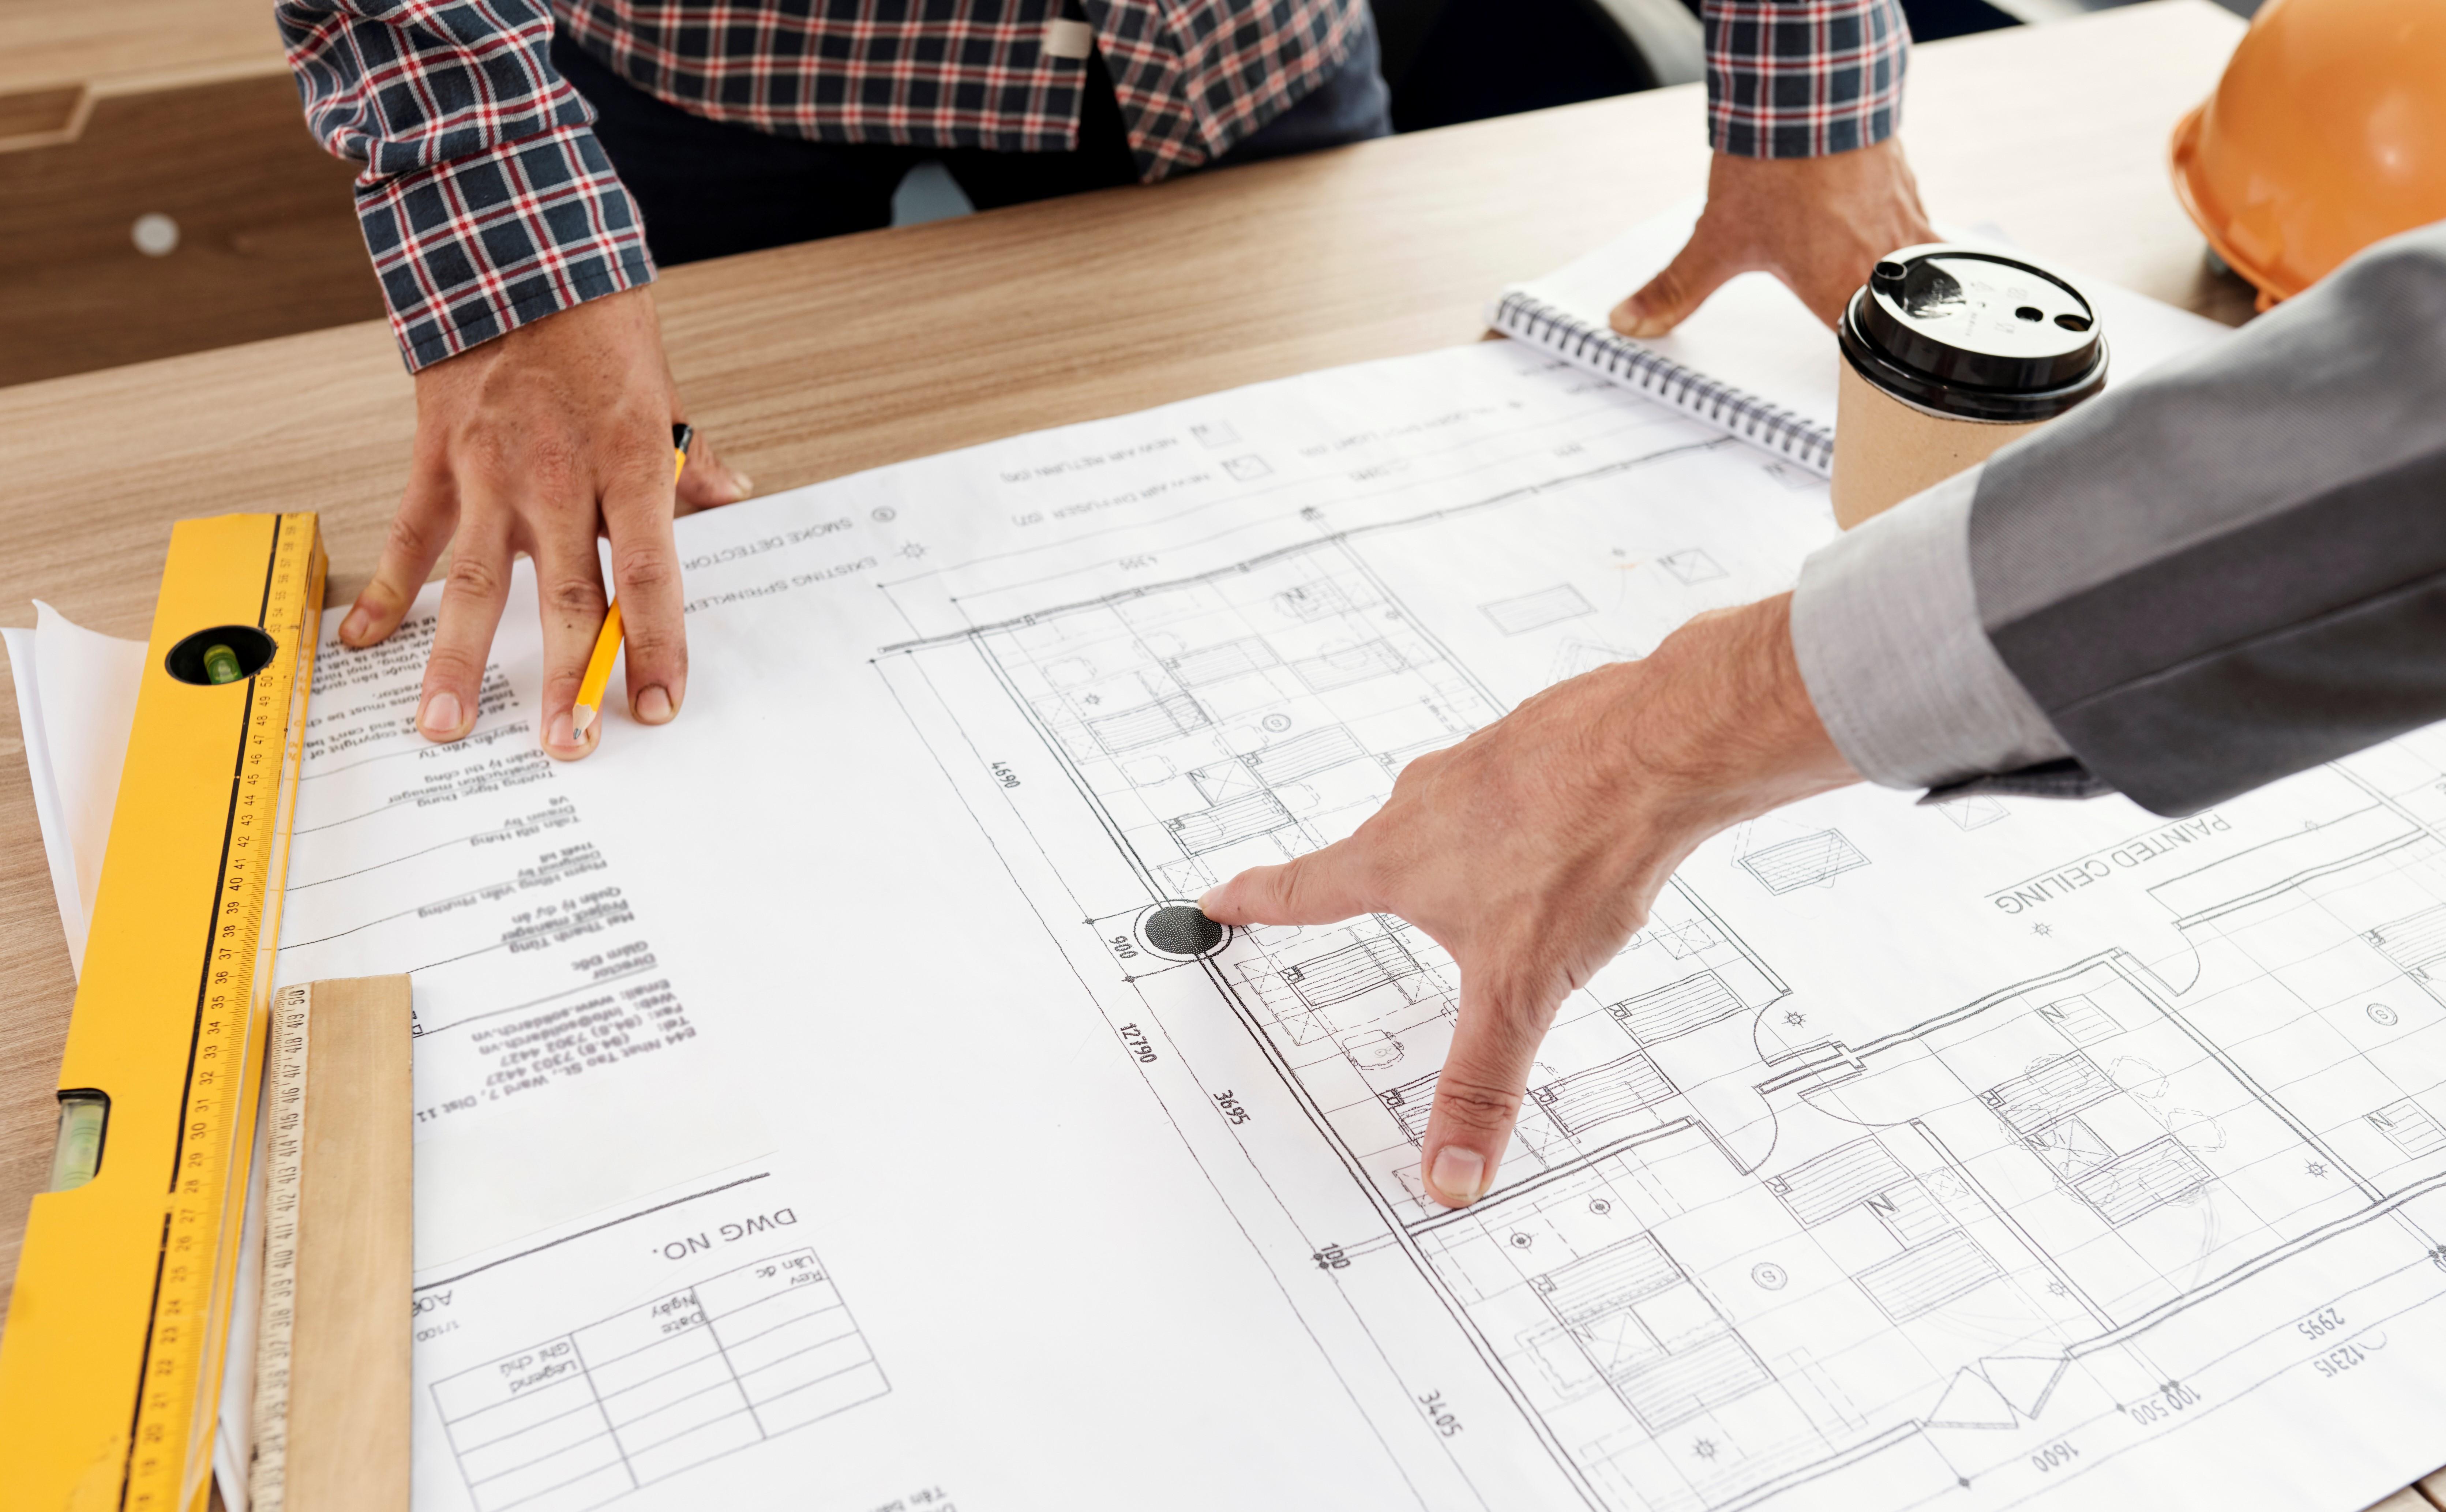 planung stromtankstelle bei immobilien